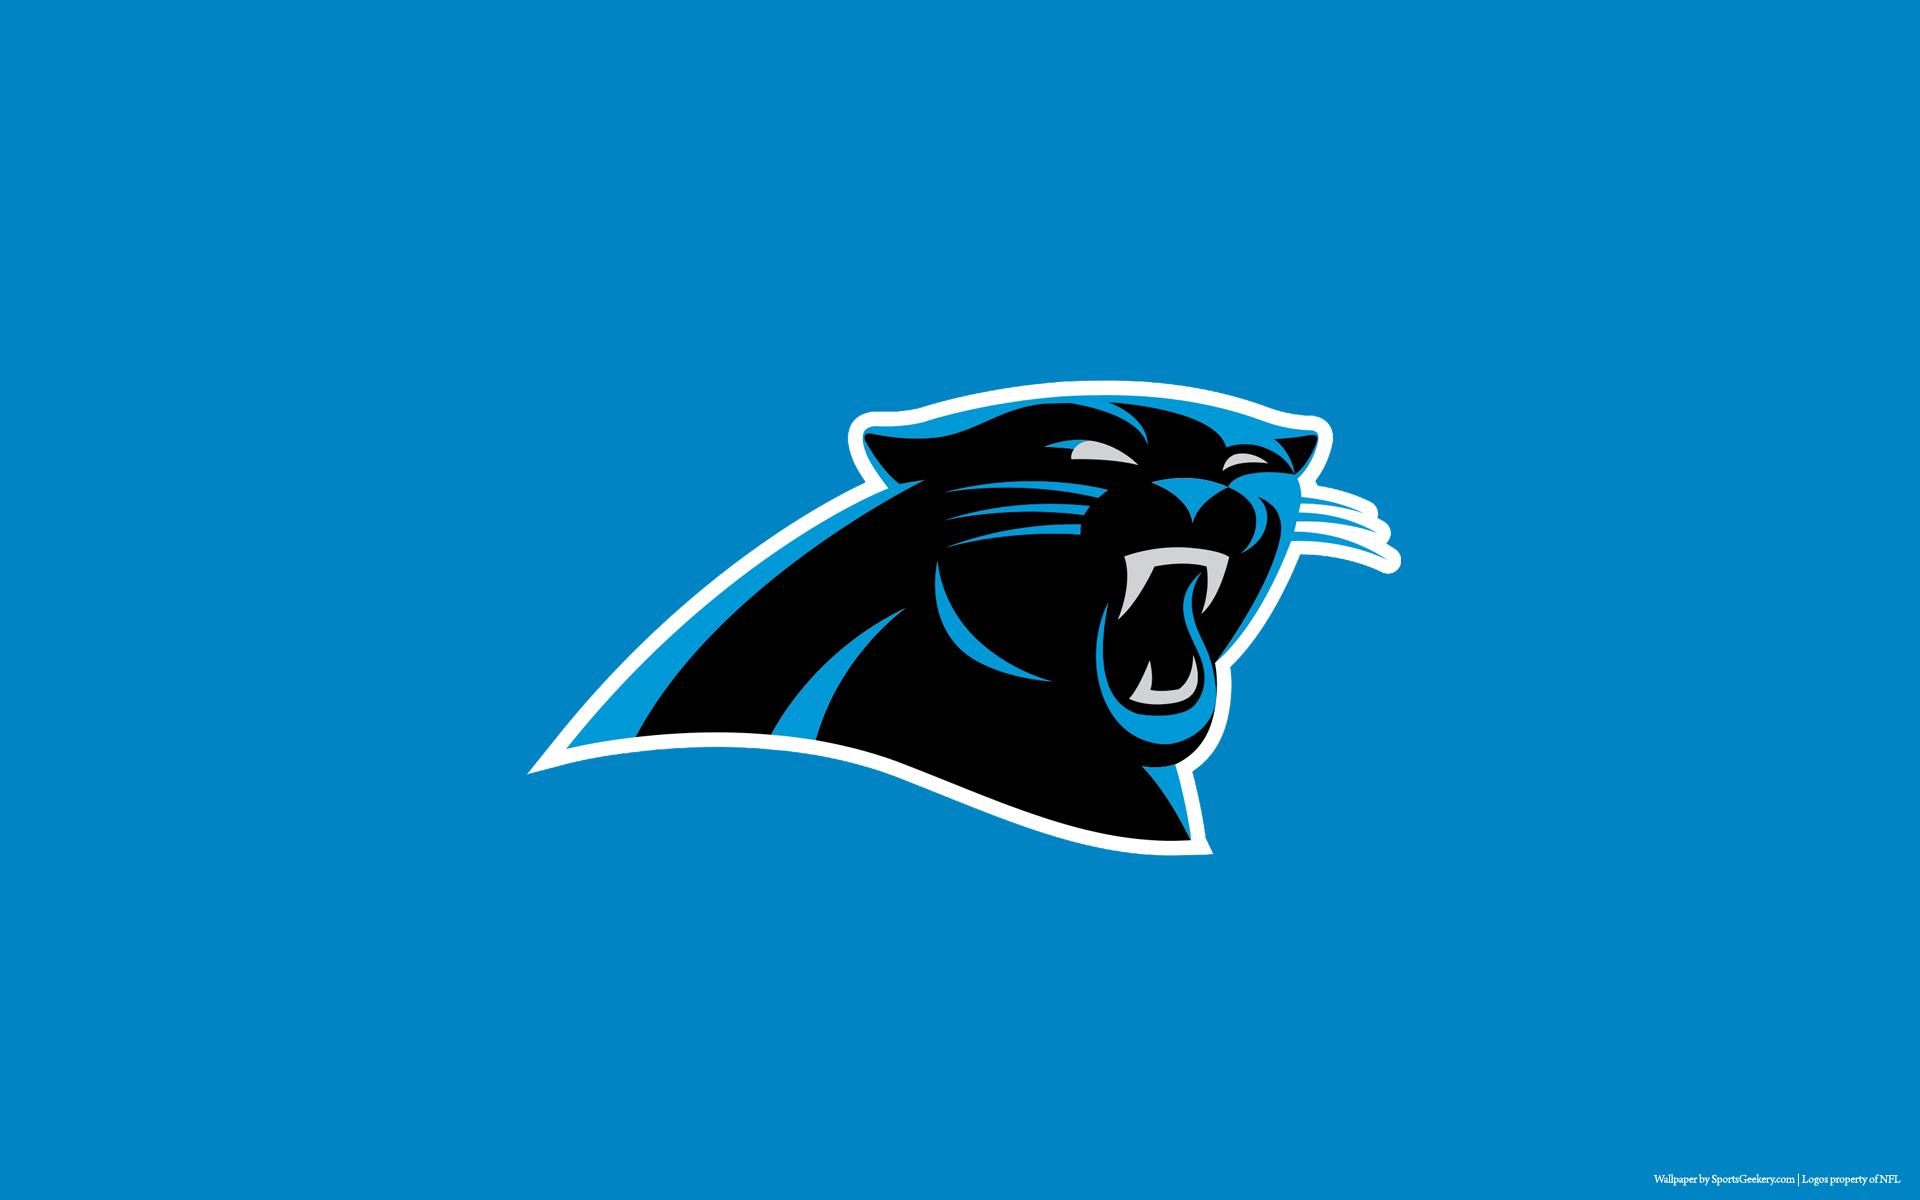 Carolina Panthers Blue Wallpaper for iPhone 3G 1920x1200